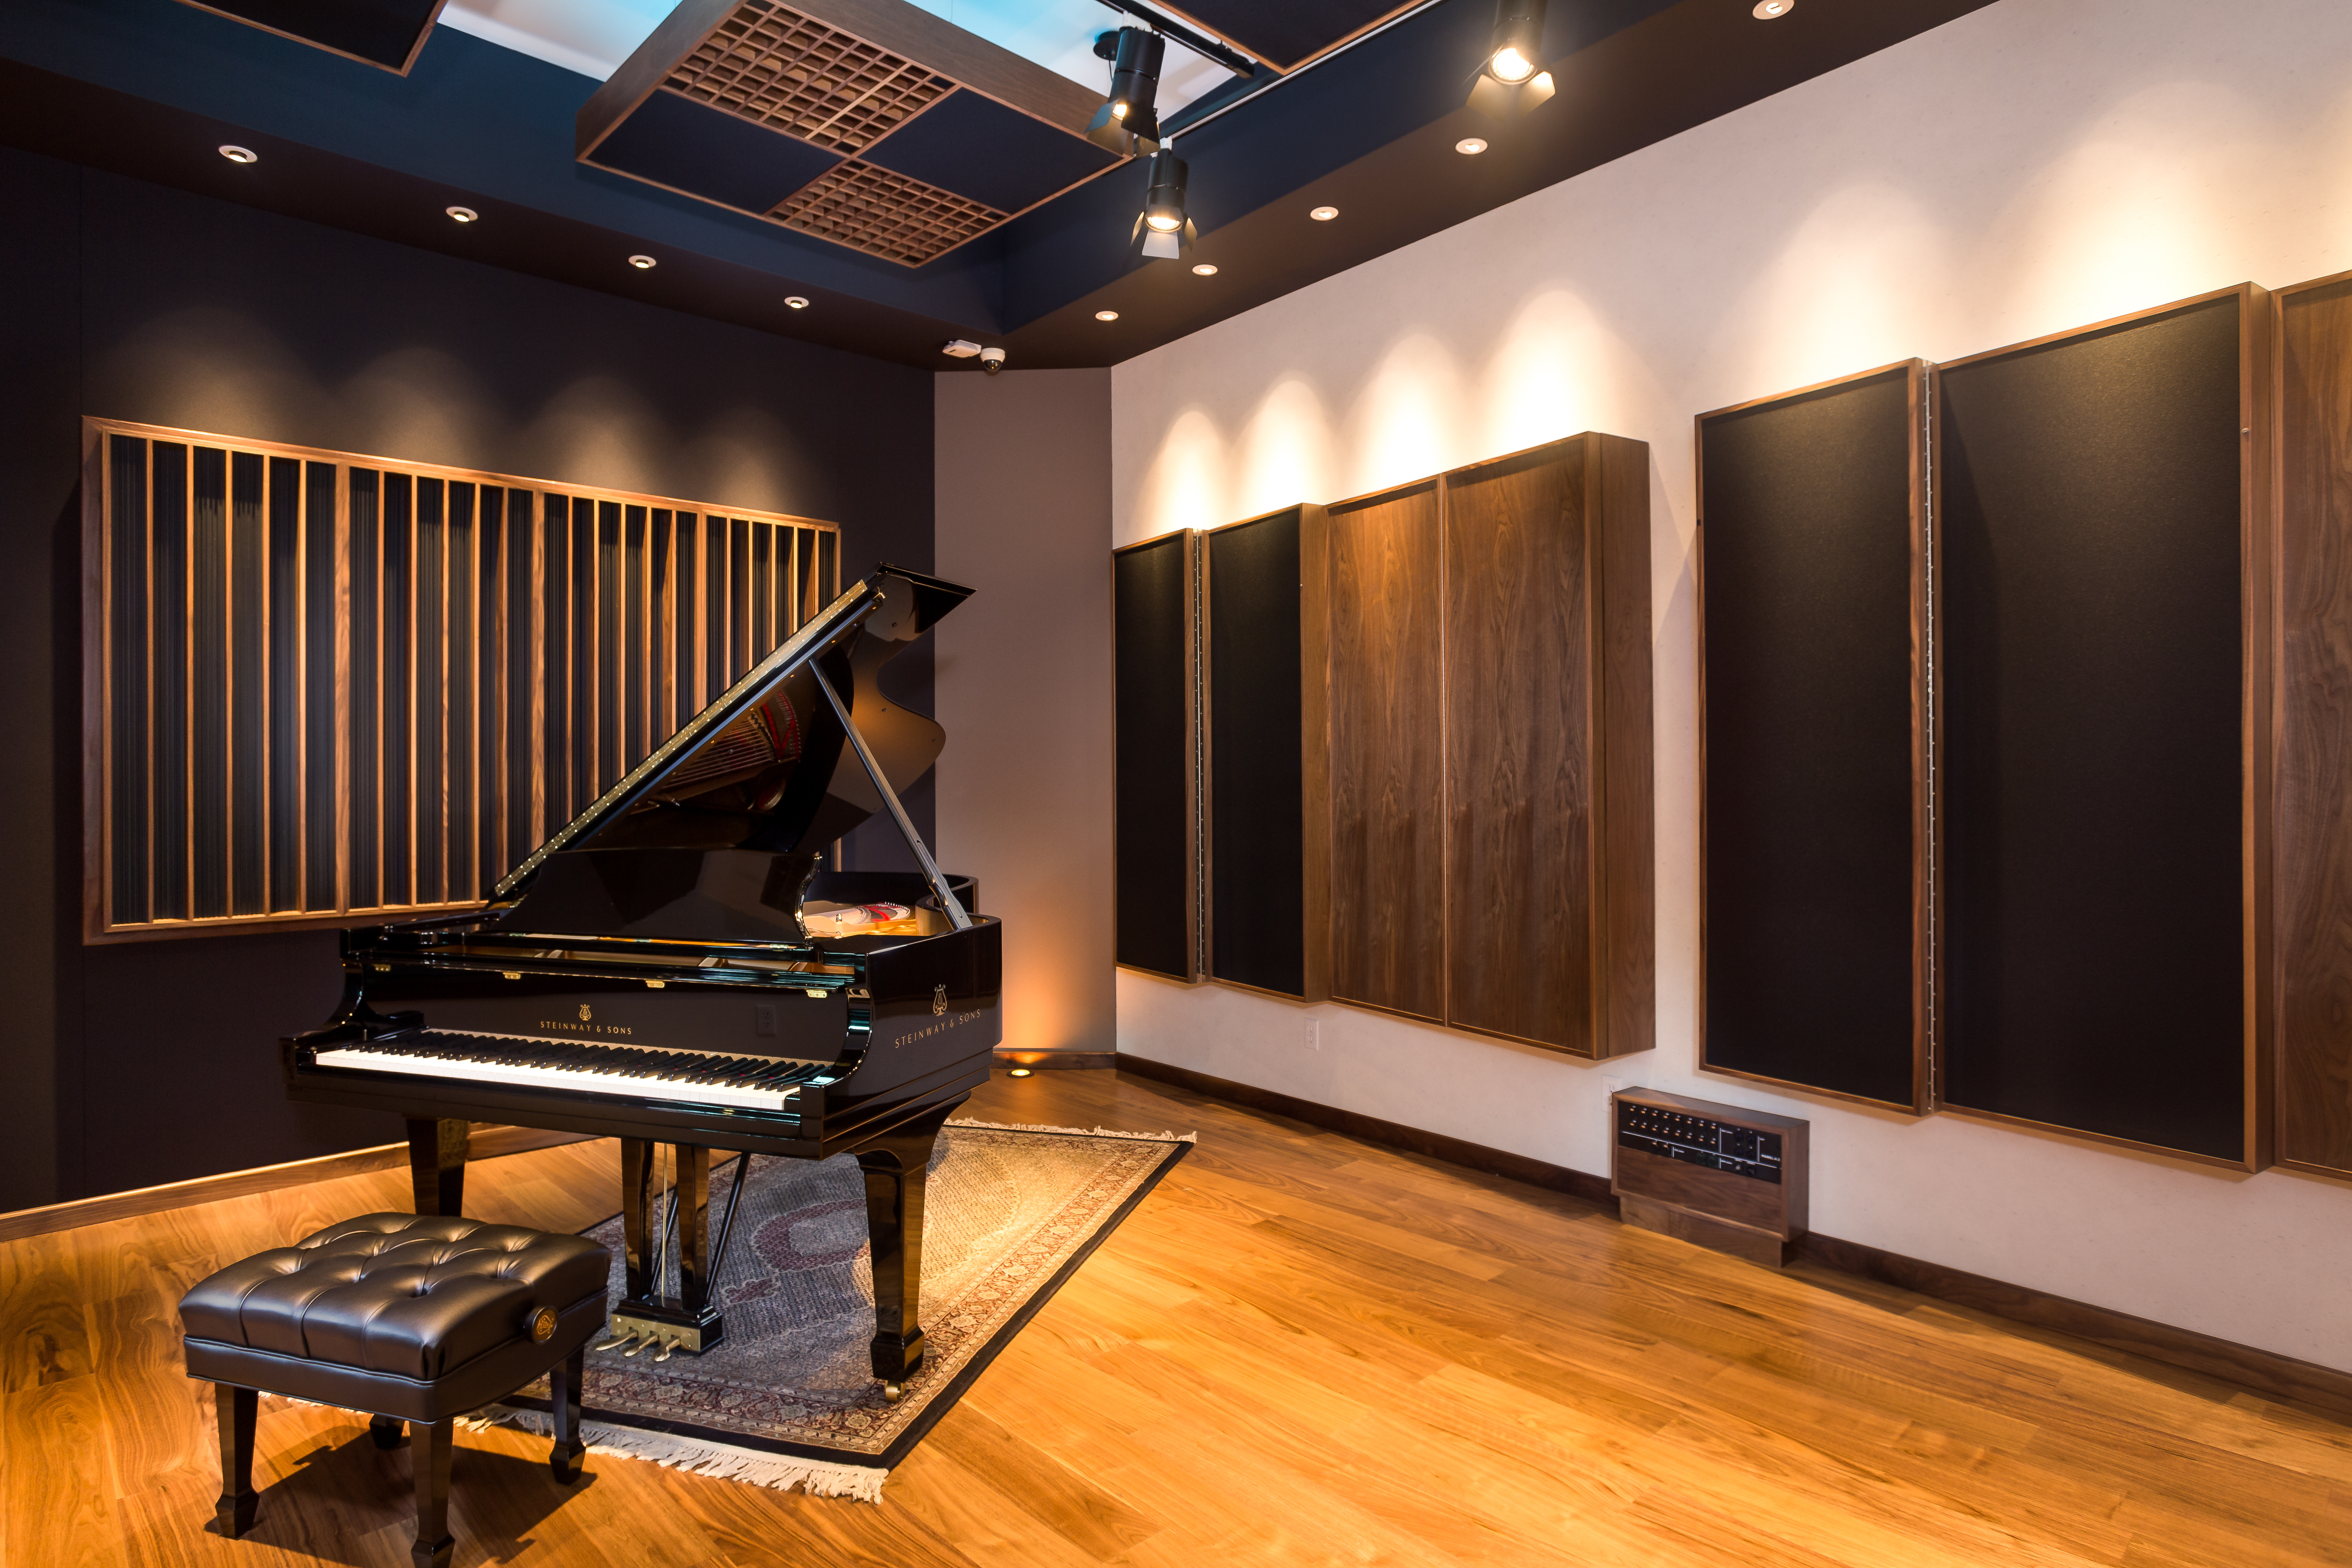 Valenzo Studios ? in partnership with Malvicino Design Group